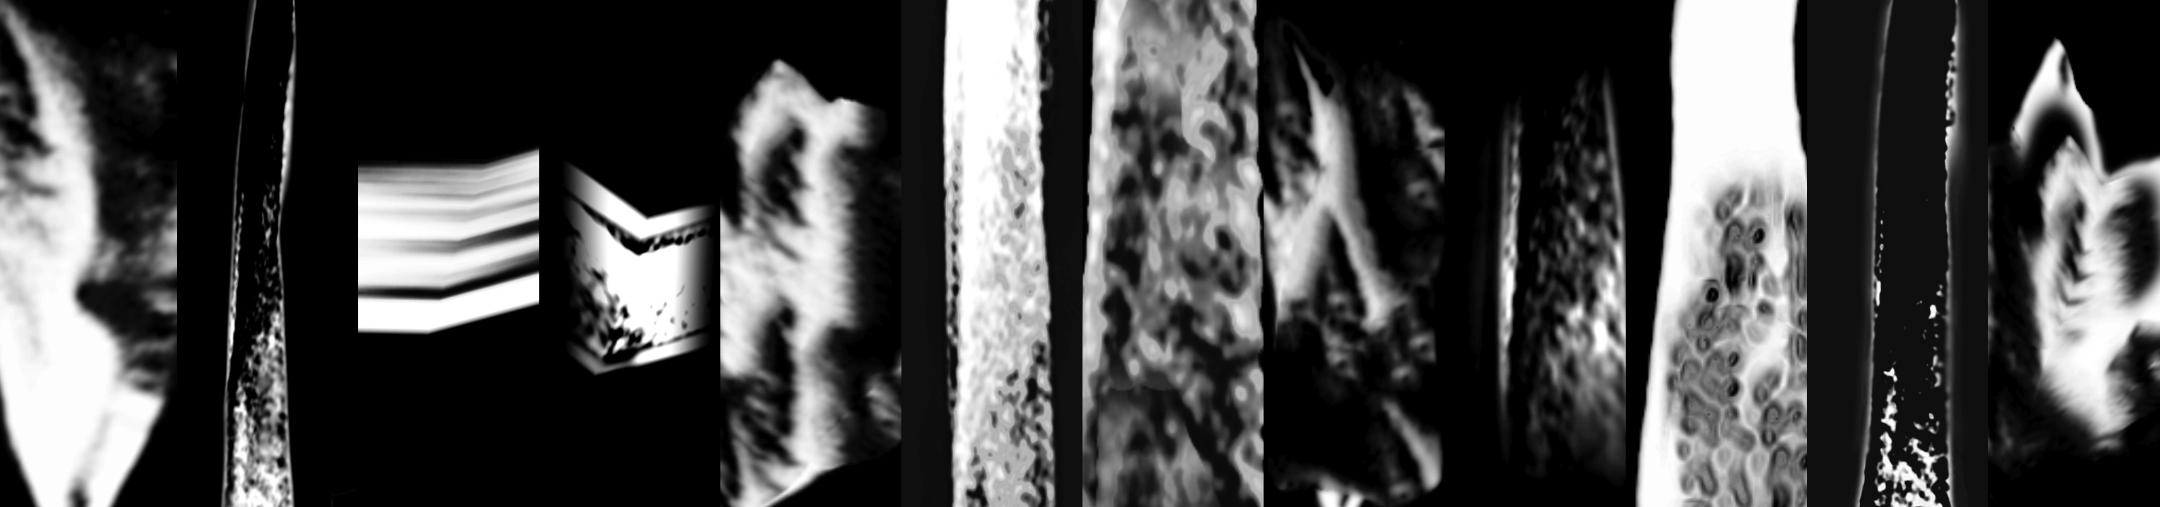 Massimiliano Viel, <cite>Cluster_03</cite>, digital image, 2014. (<c> Massimiliano Viel)